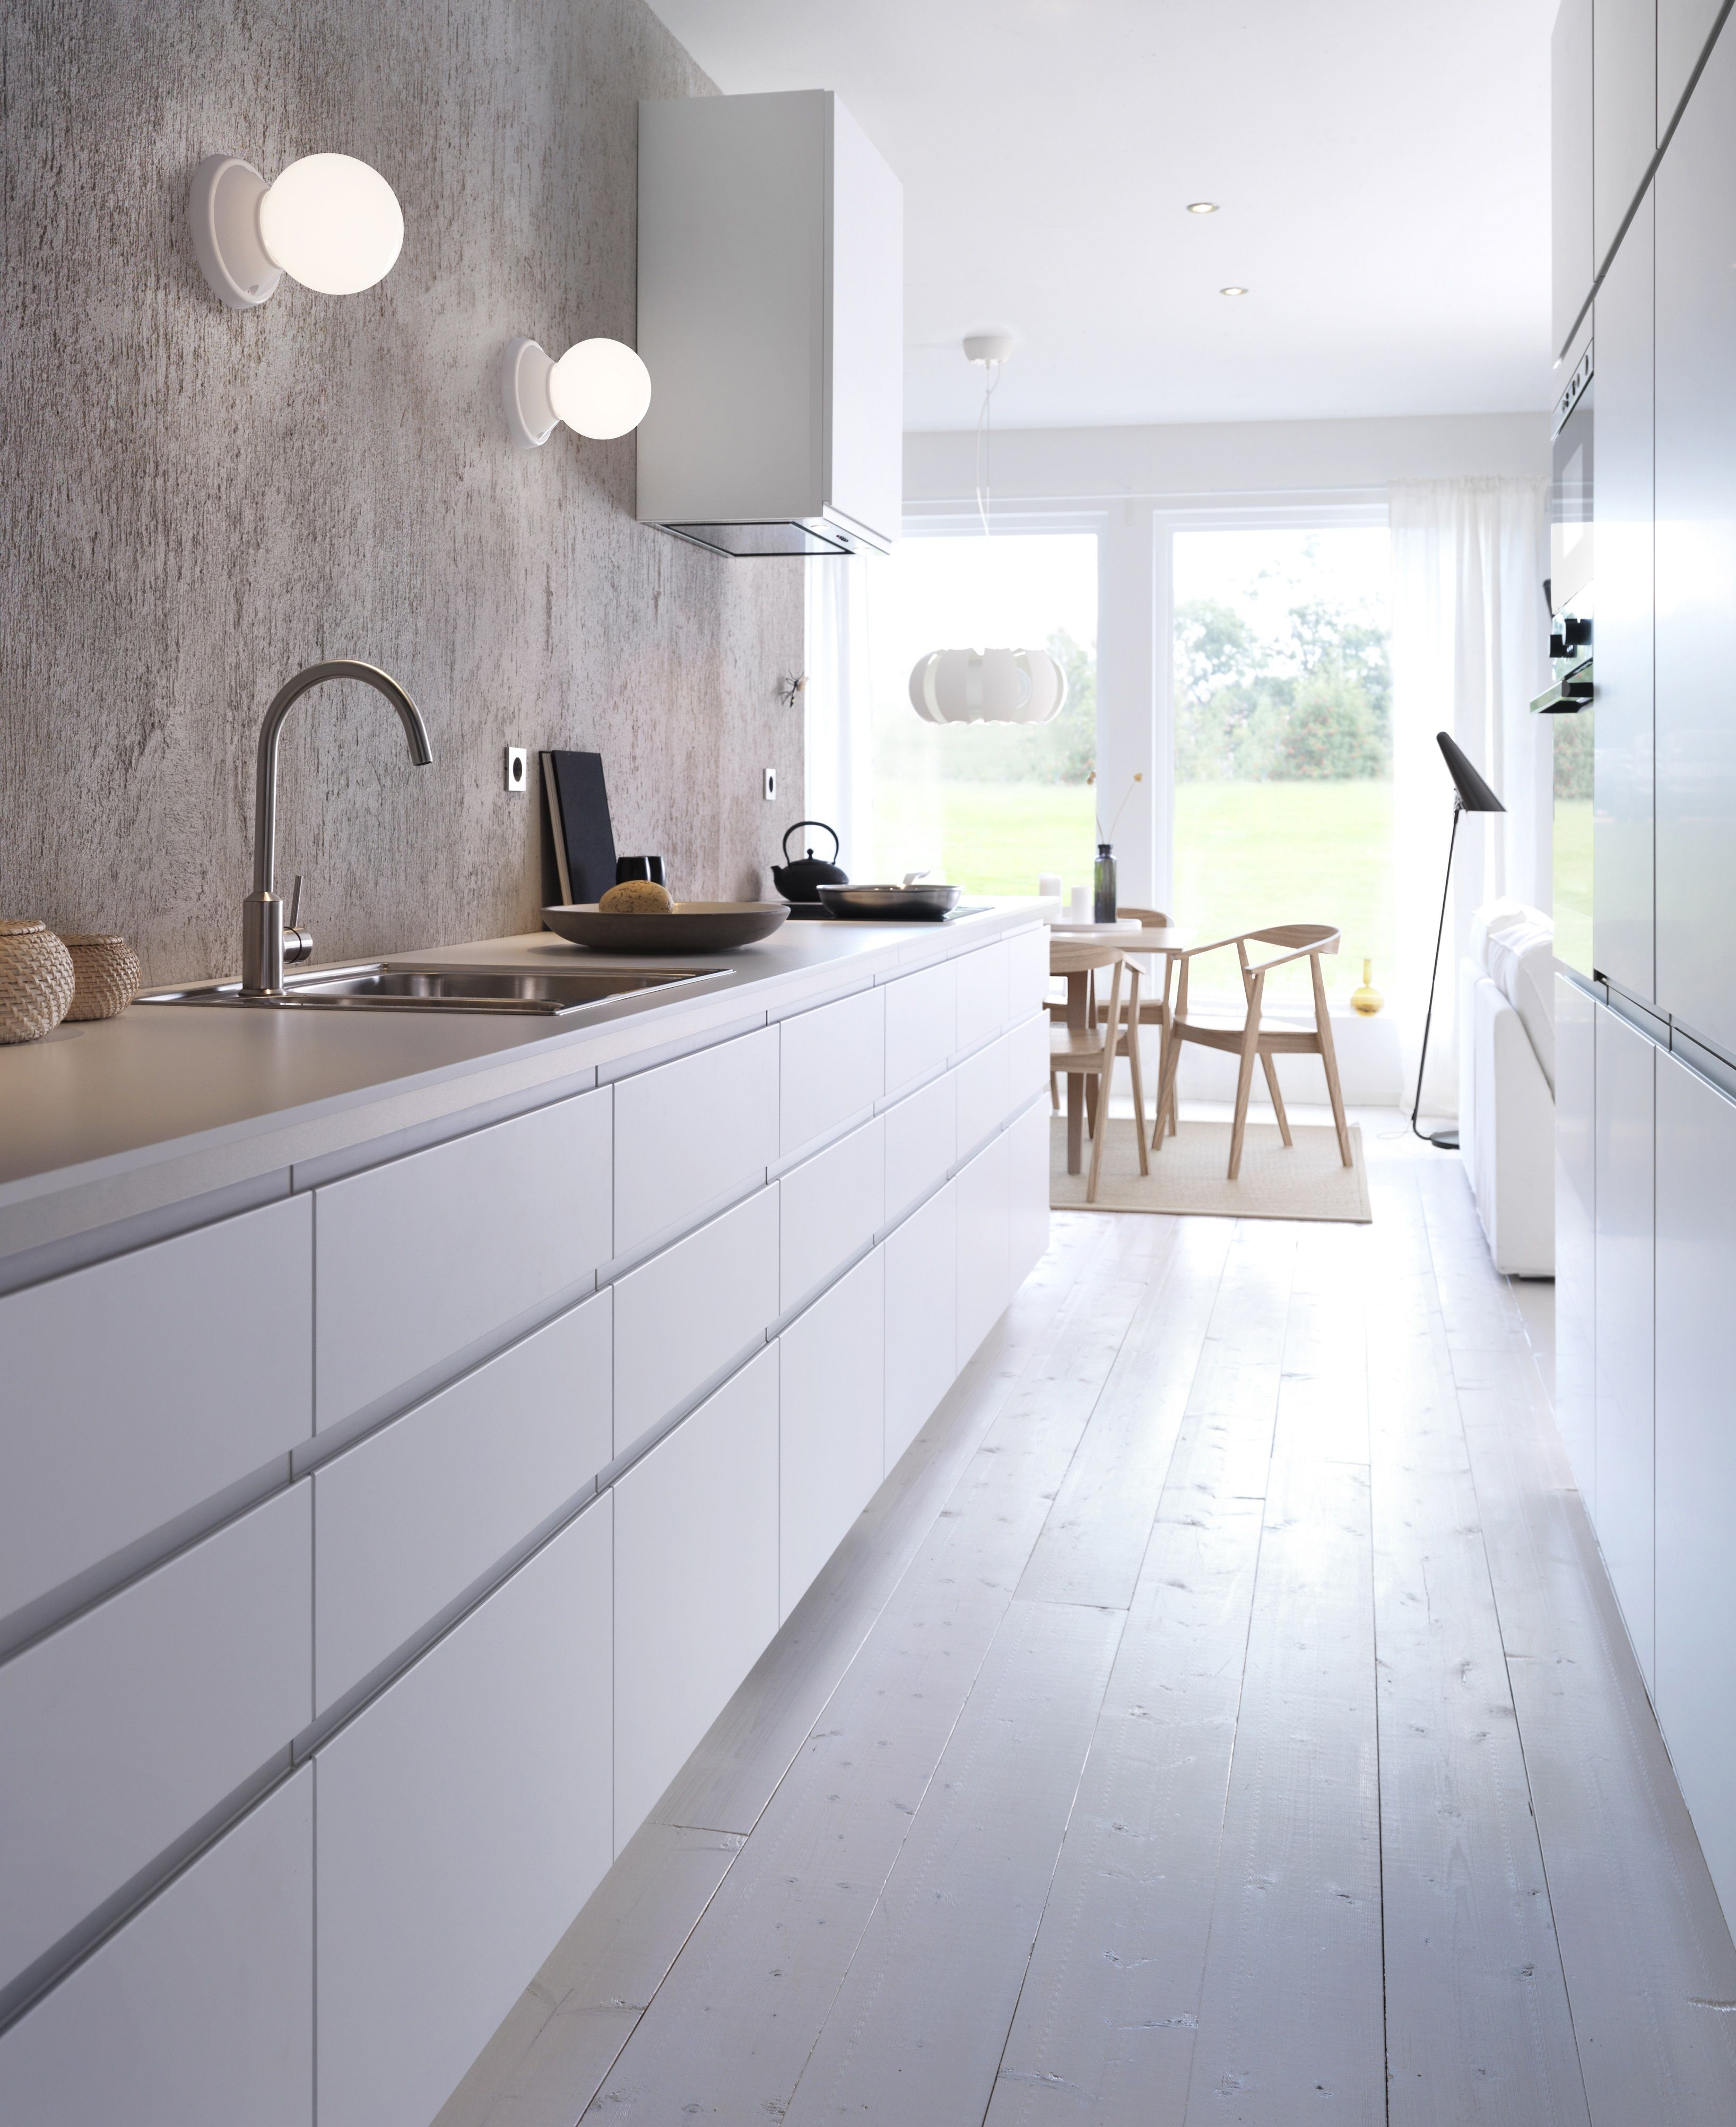 Kitchen, minimalist, white, no cabinets   Kitchens in 2018 ...